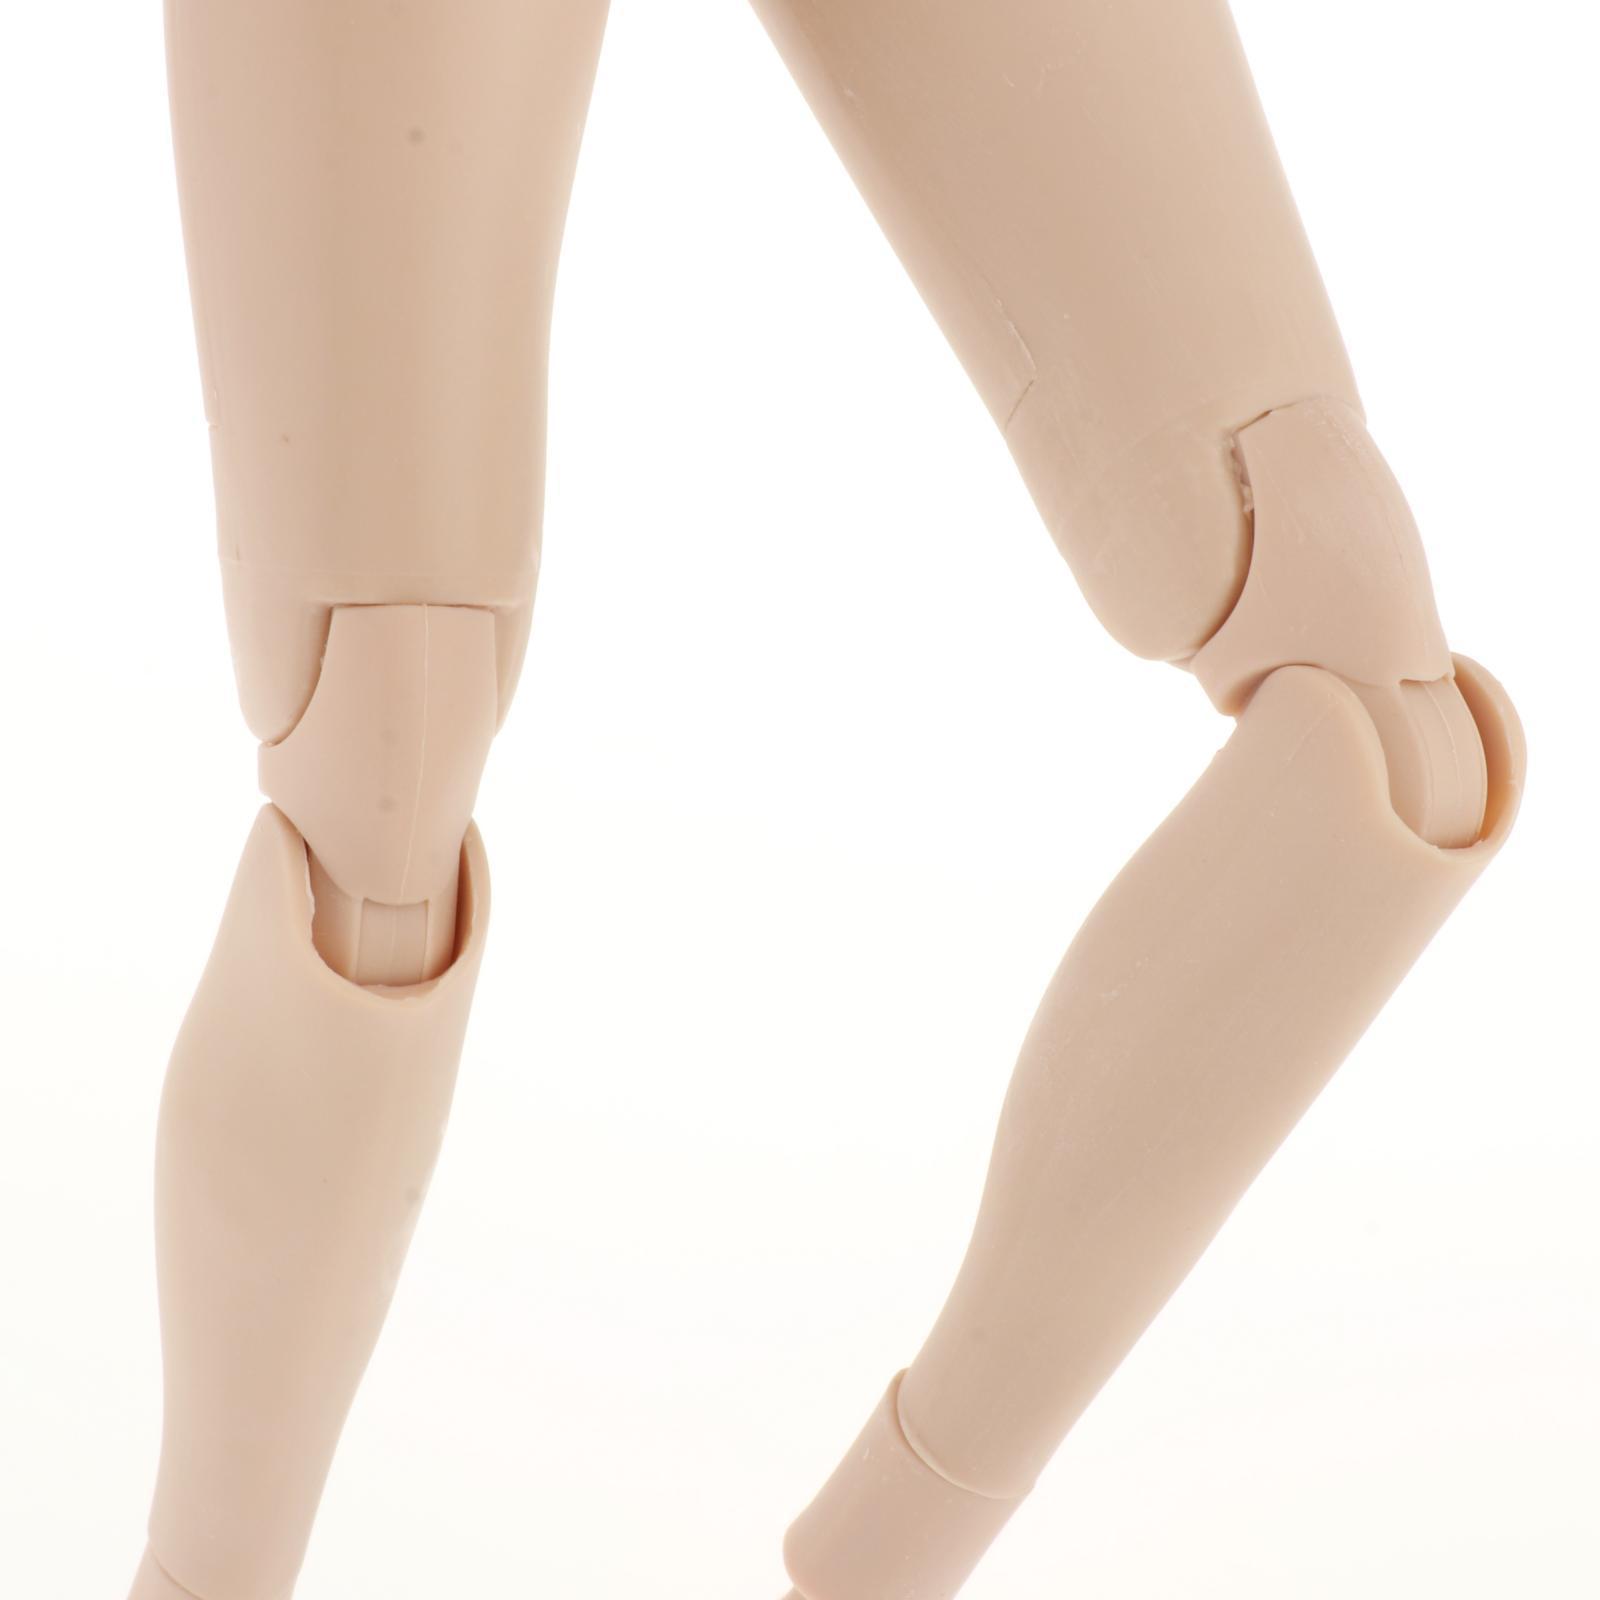 miniature 26 - 1/6 Scale Female Flexible Body 12 Inches Action Figure Body Seamless Figure